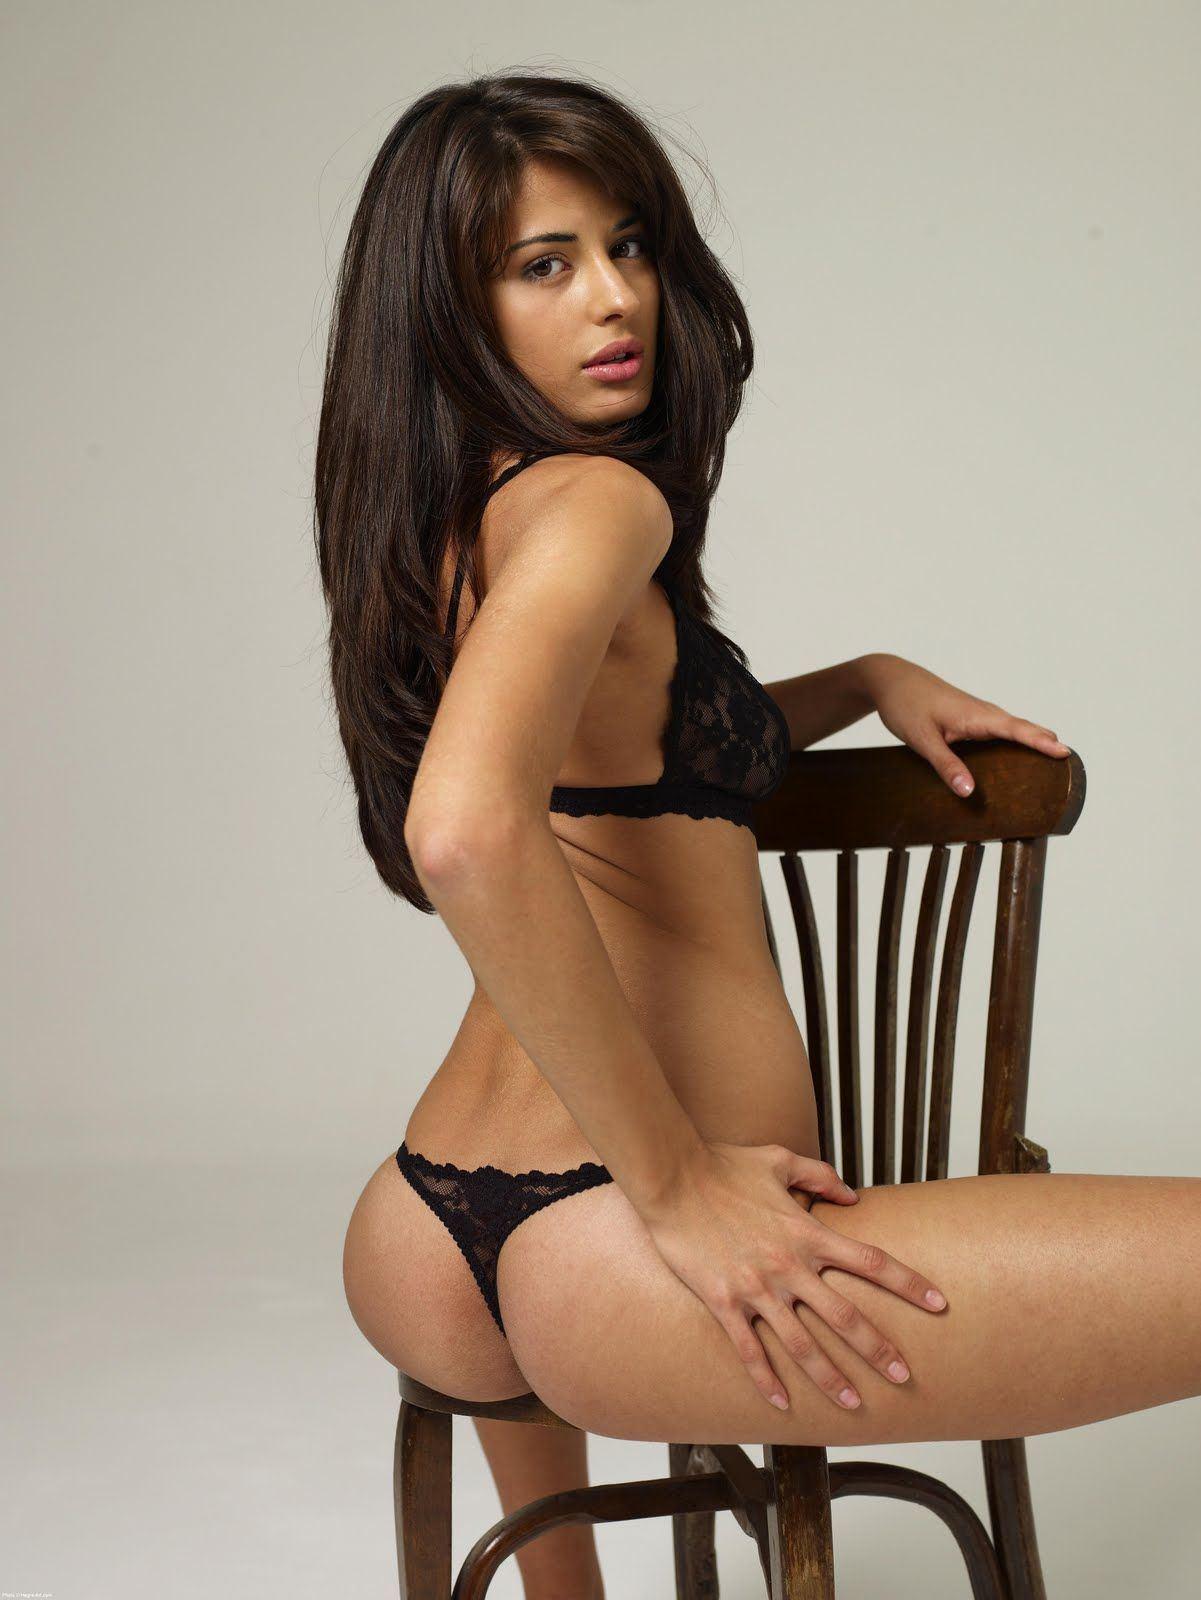 Naked women models uncensored consider